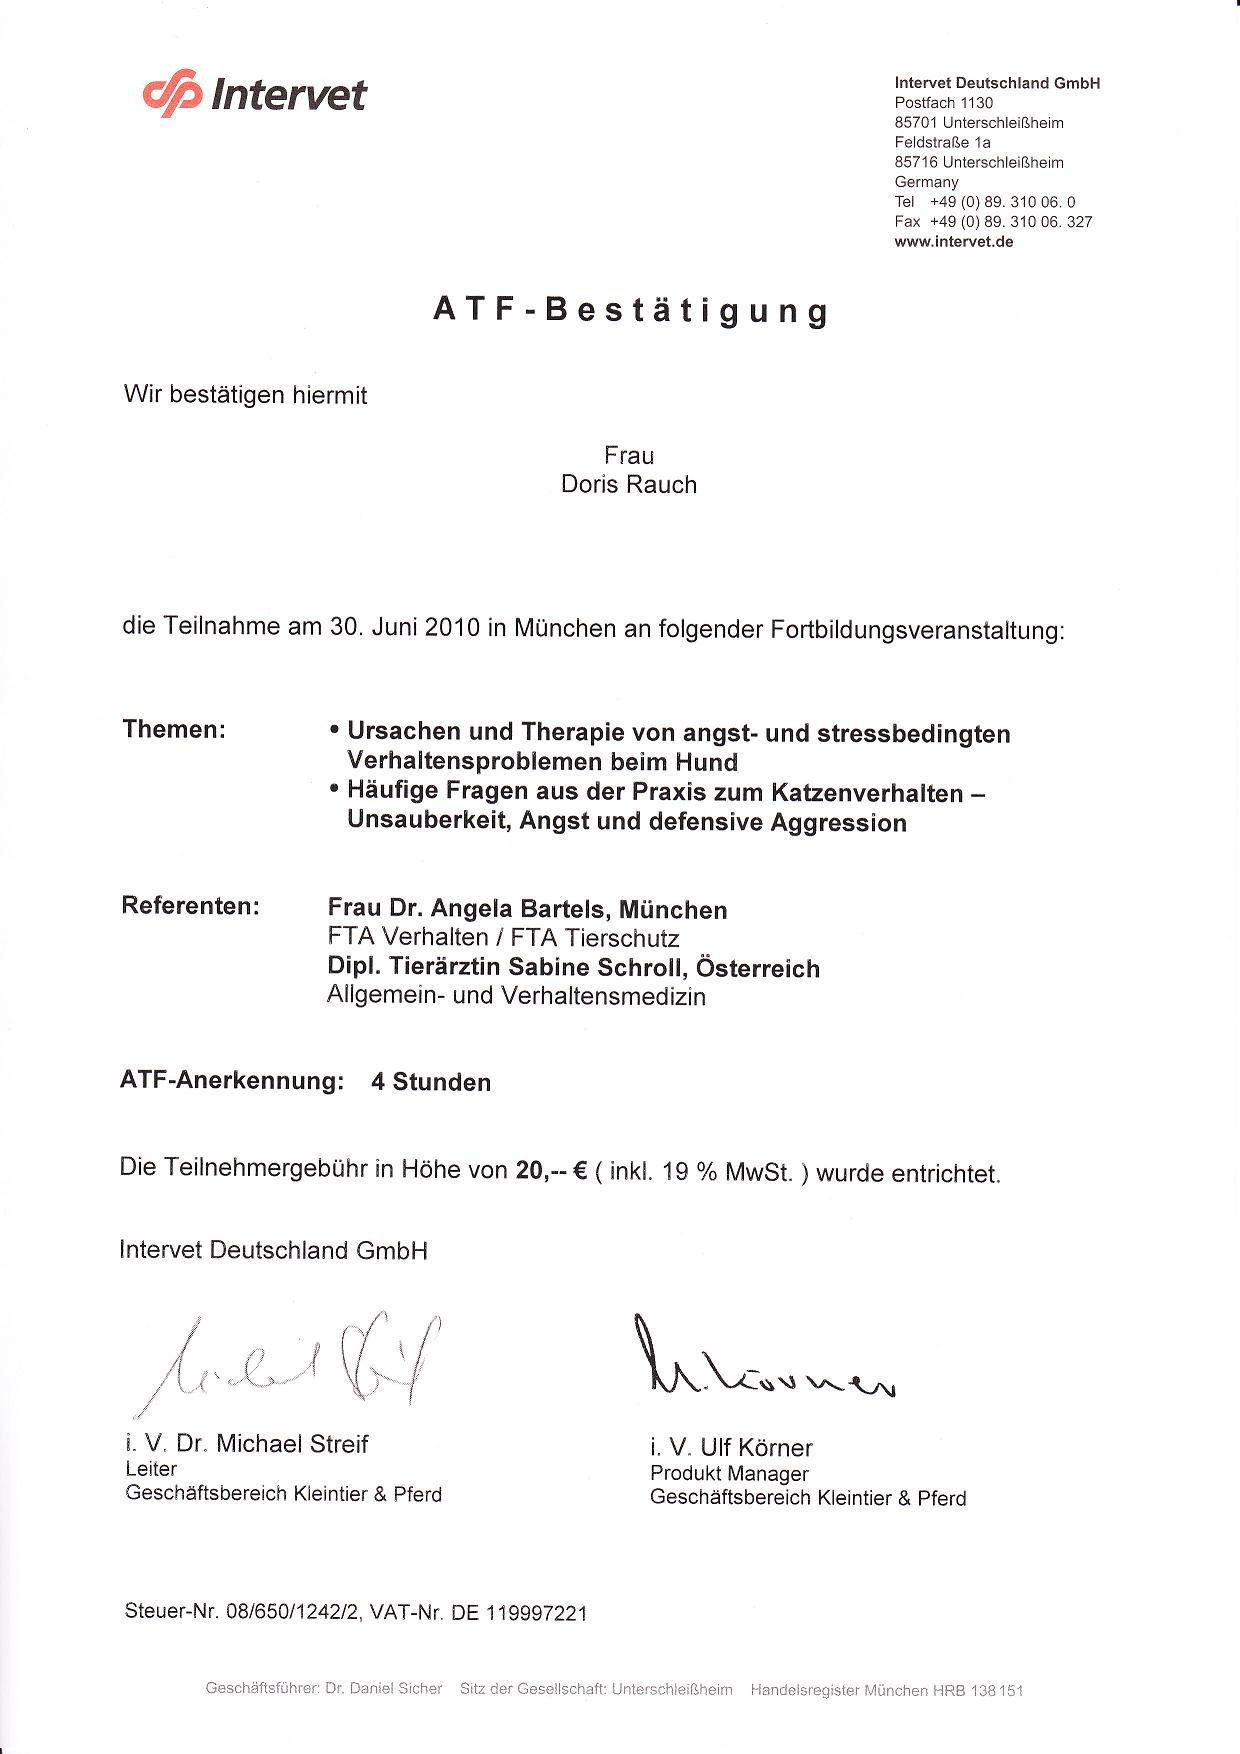 ATF-Bestätigung